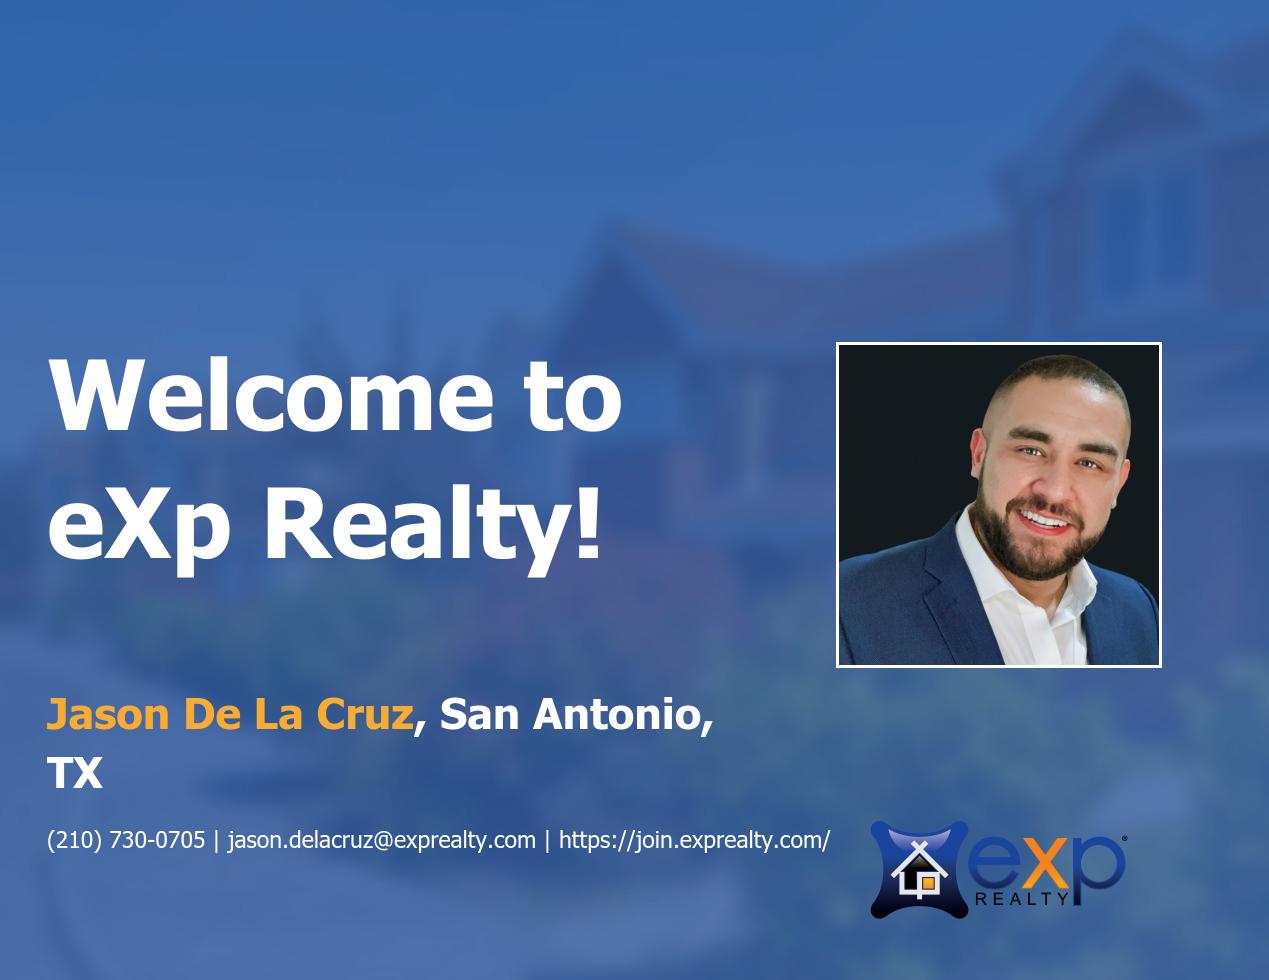 Jason De La Cruz Joined eXp Realty!